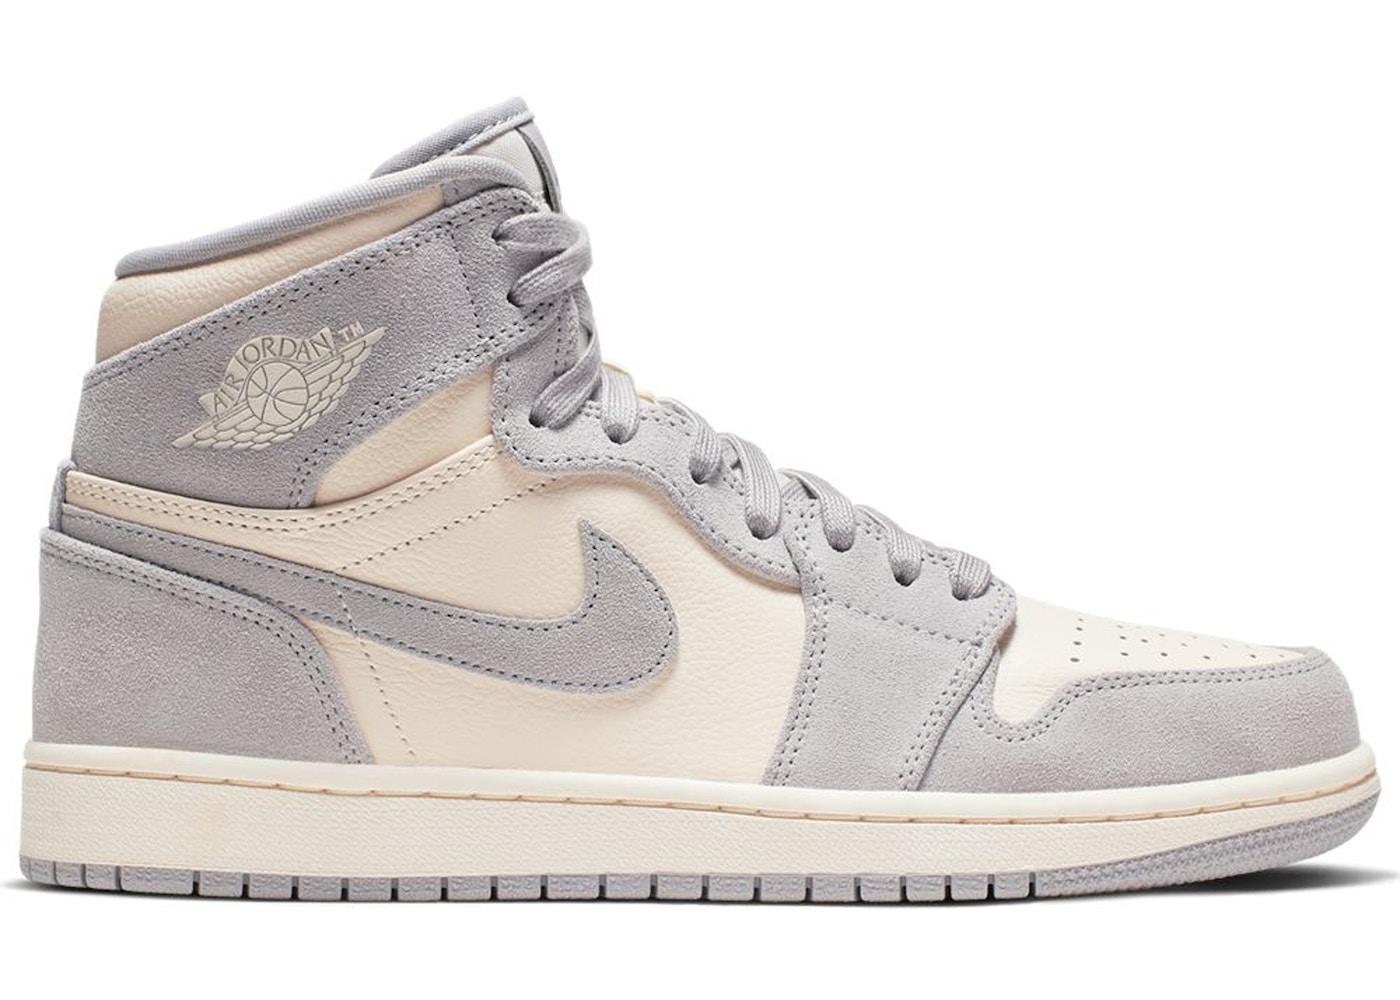 new style ff8ec 26ac6 Air Jordan 1 Shoes - Release Date